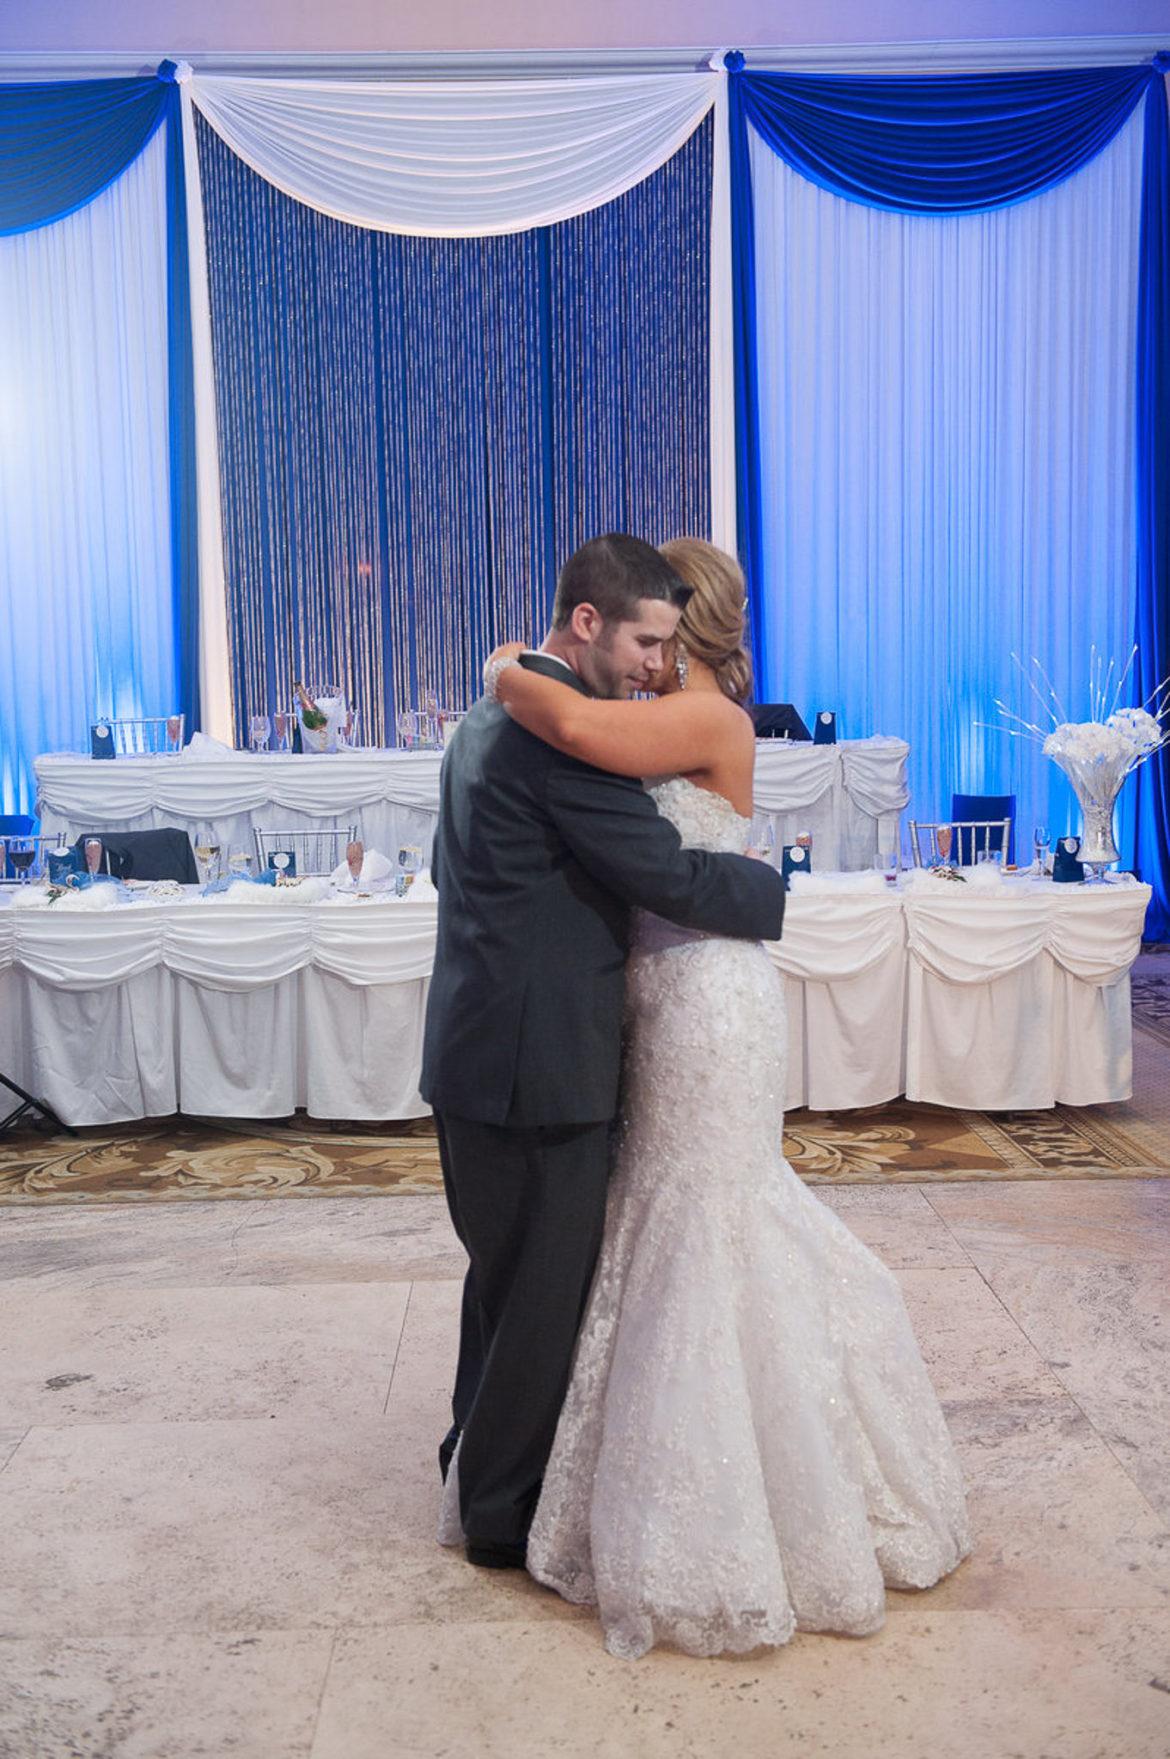 Elegant_Event_Lighting_Chicago_Venutis_Addison_Wedding_Crystal_Curtain_Backdrop_First_Dance_Reception